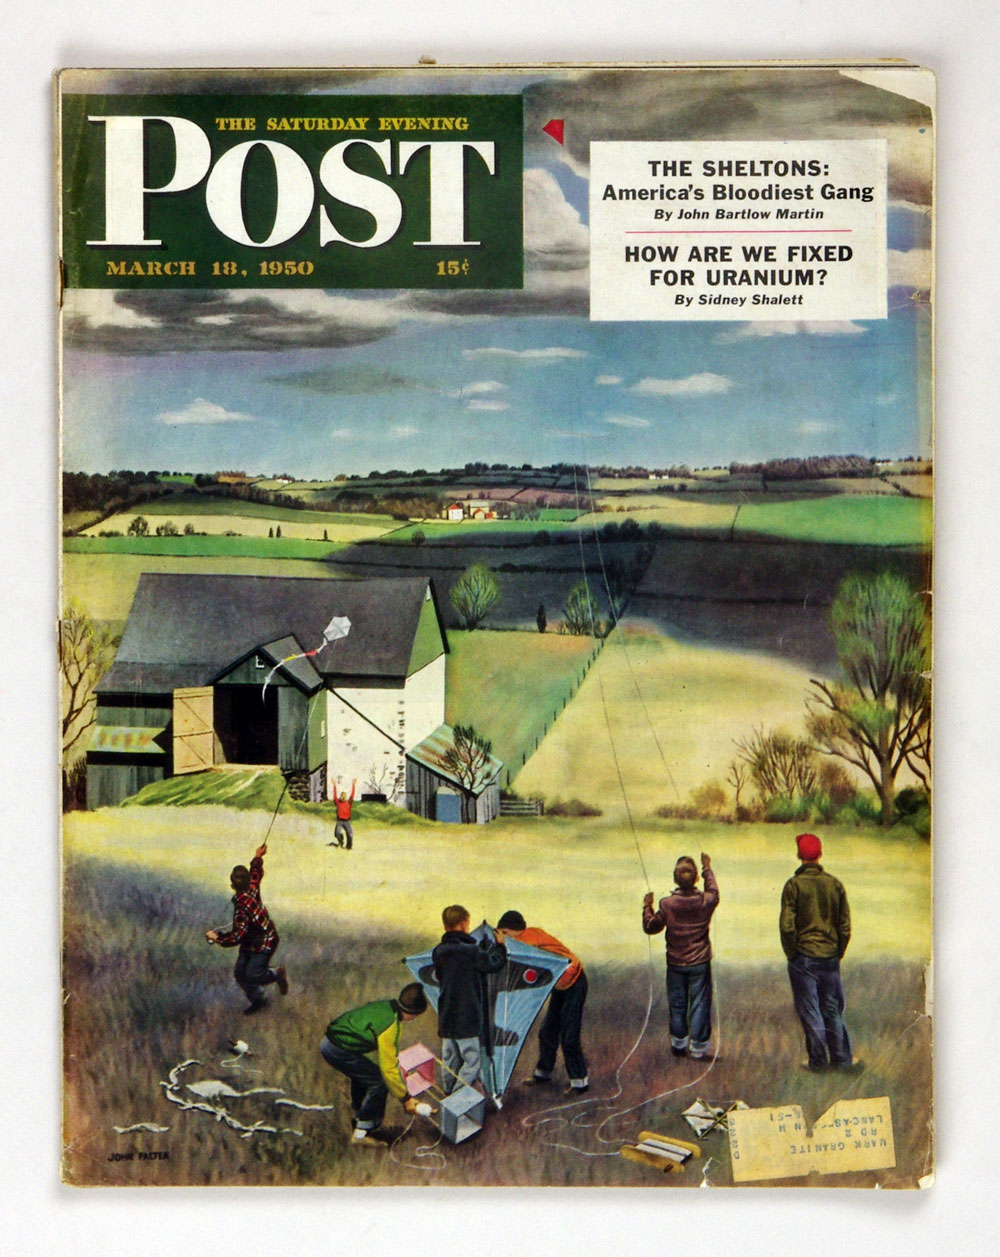 The Saturday Evening Post 1950 Mar 18 Kite Flying